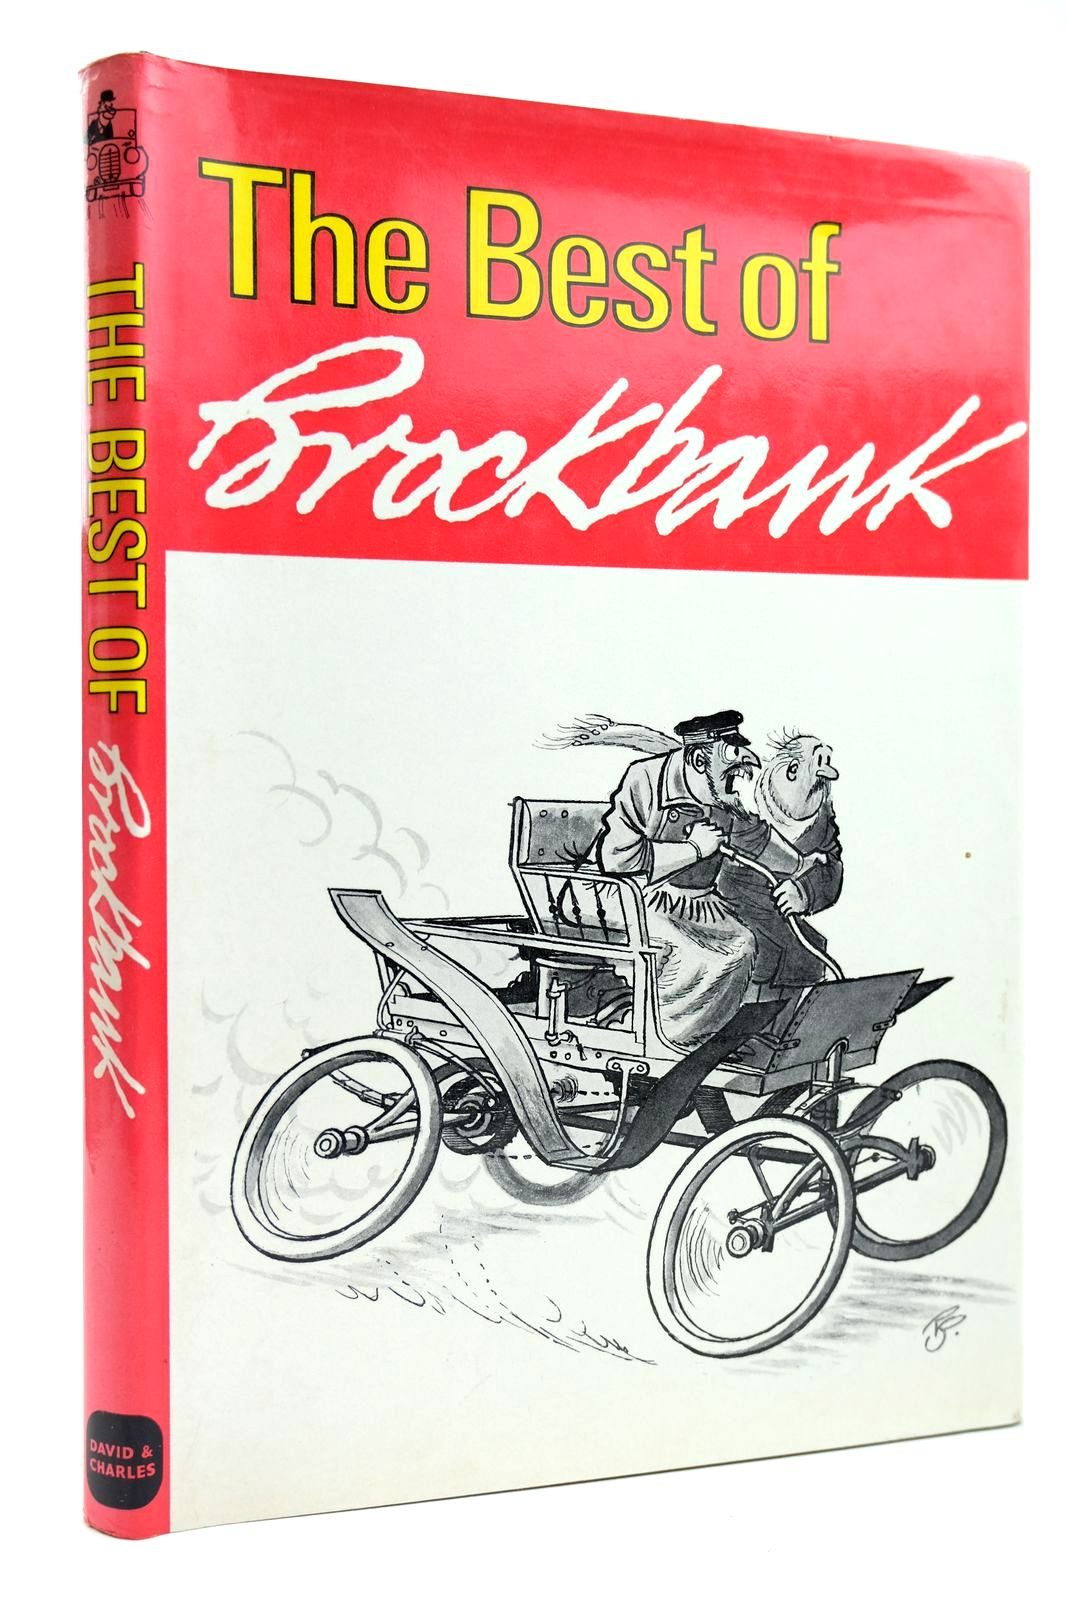 Photo of THE BEST OF BROCKBANK